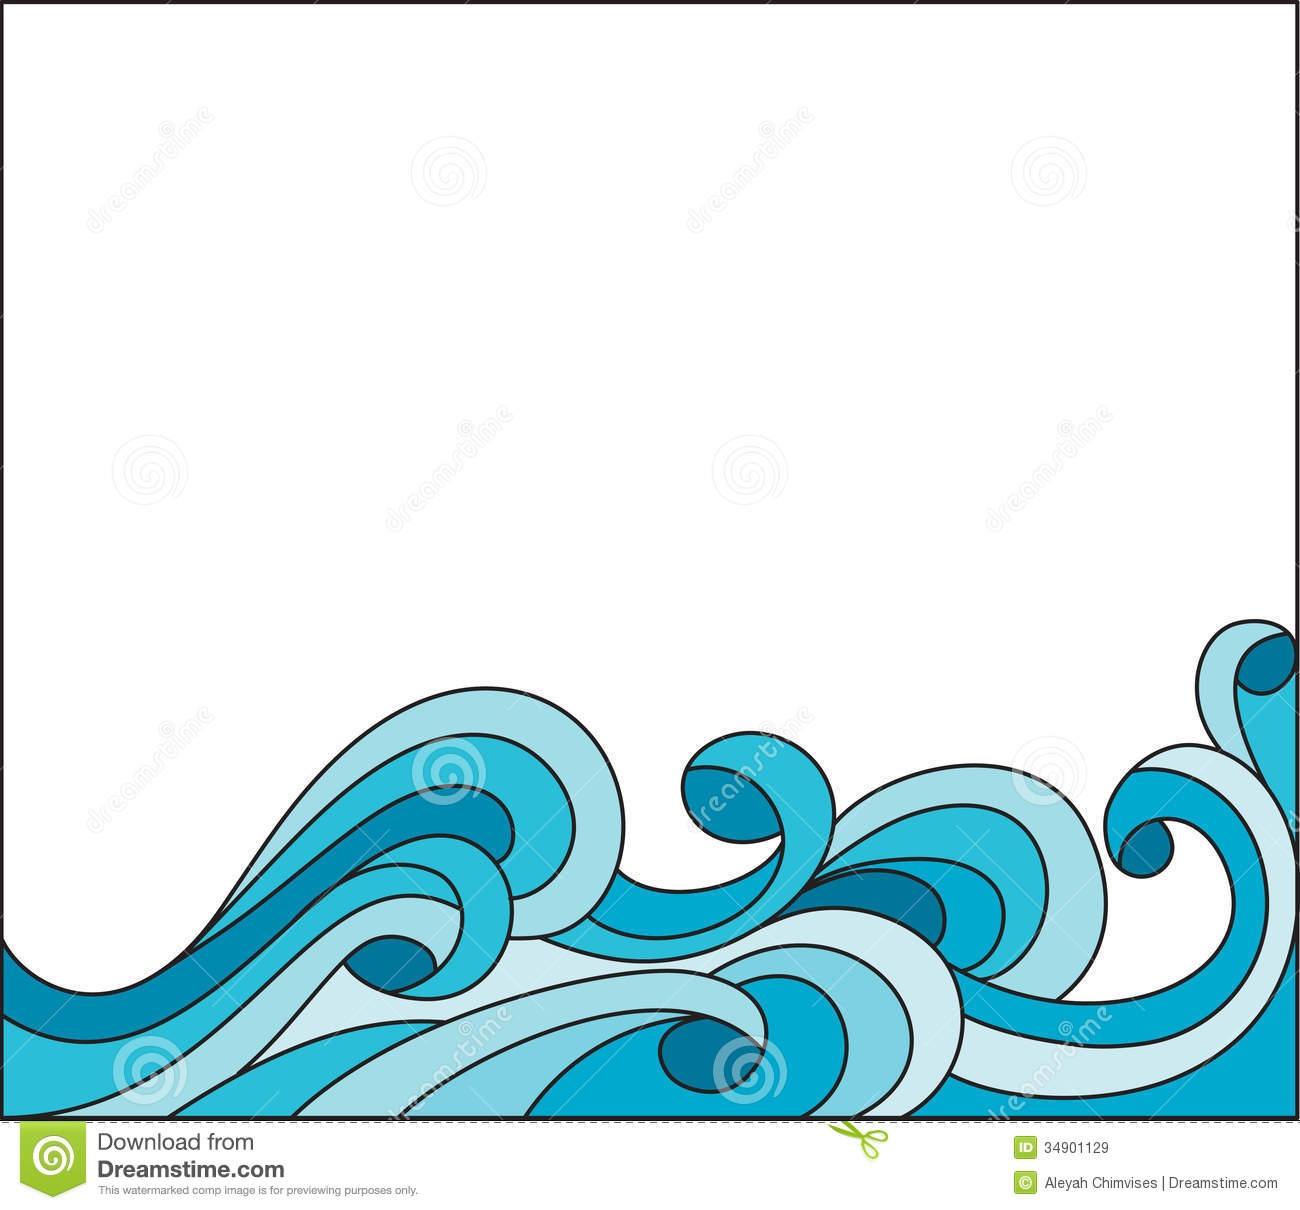 Waves Clip Art Border.